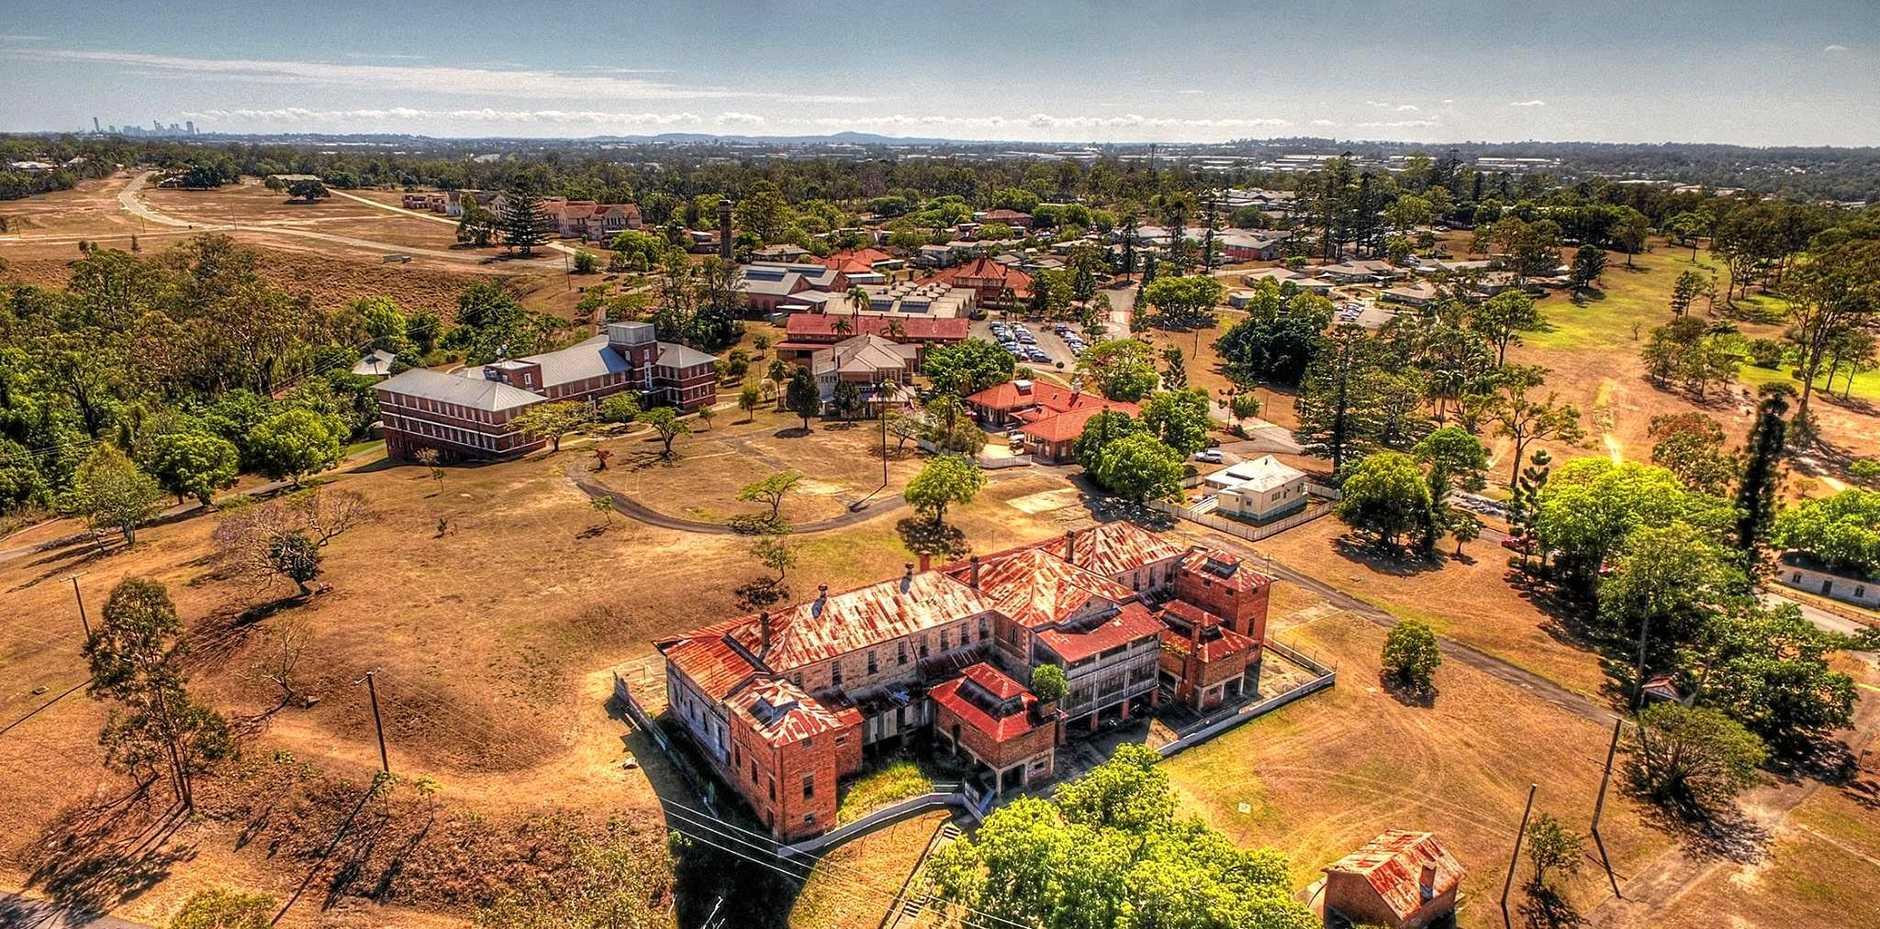 An Aerial shot of the The Park precinct, originally named as the Woogaroo Lunatic Asylum, opened in 1864.